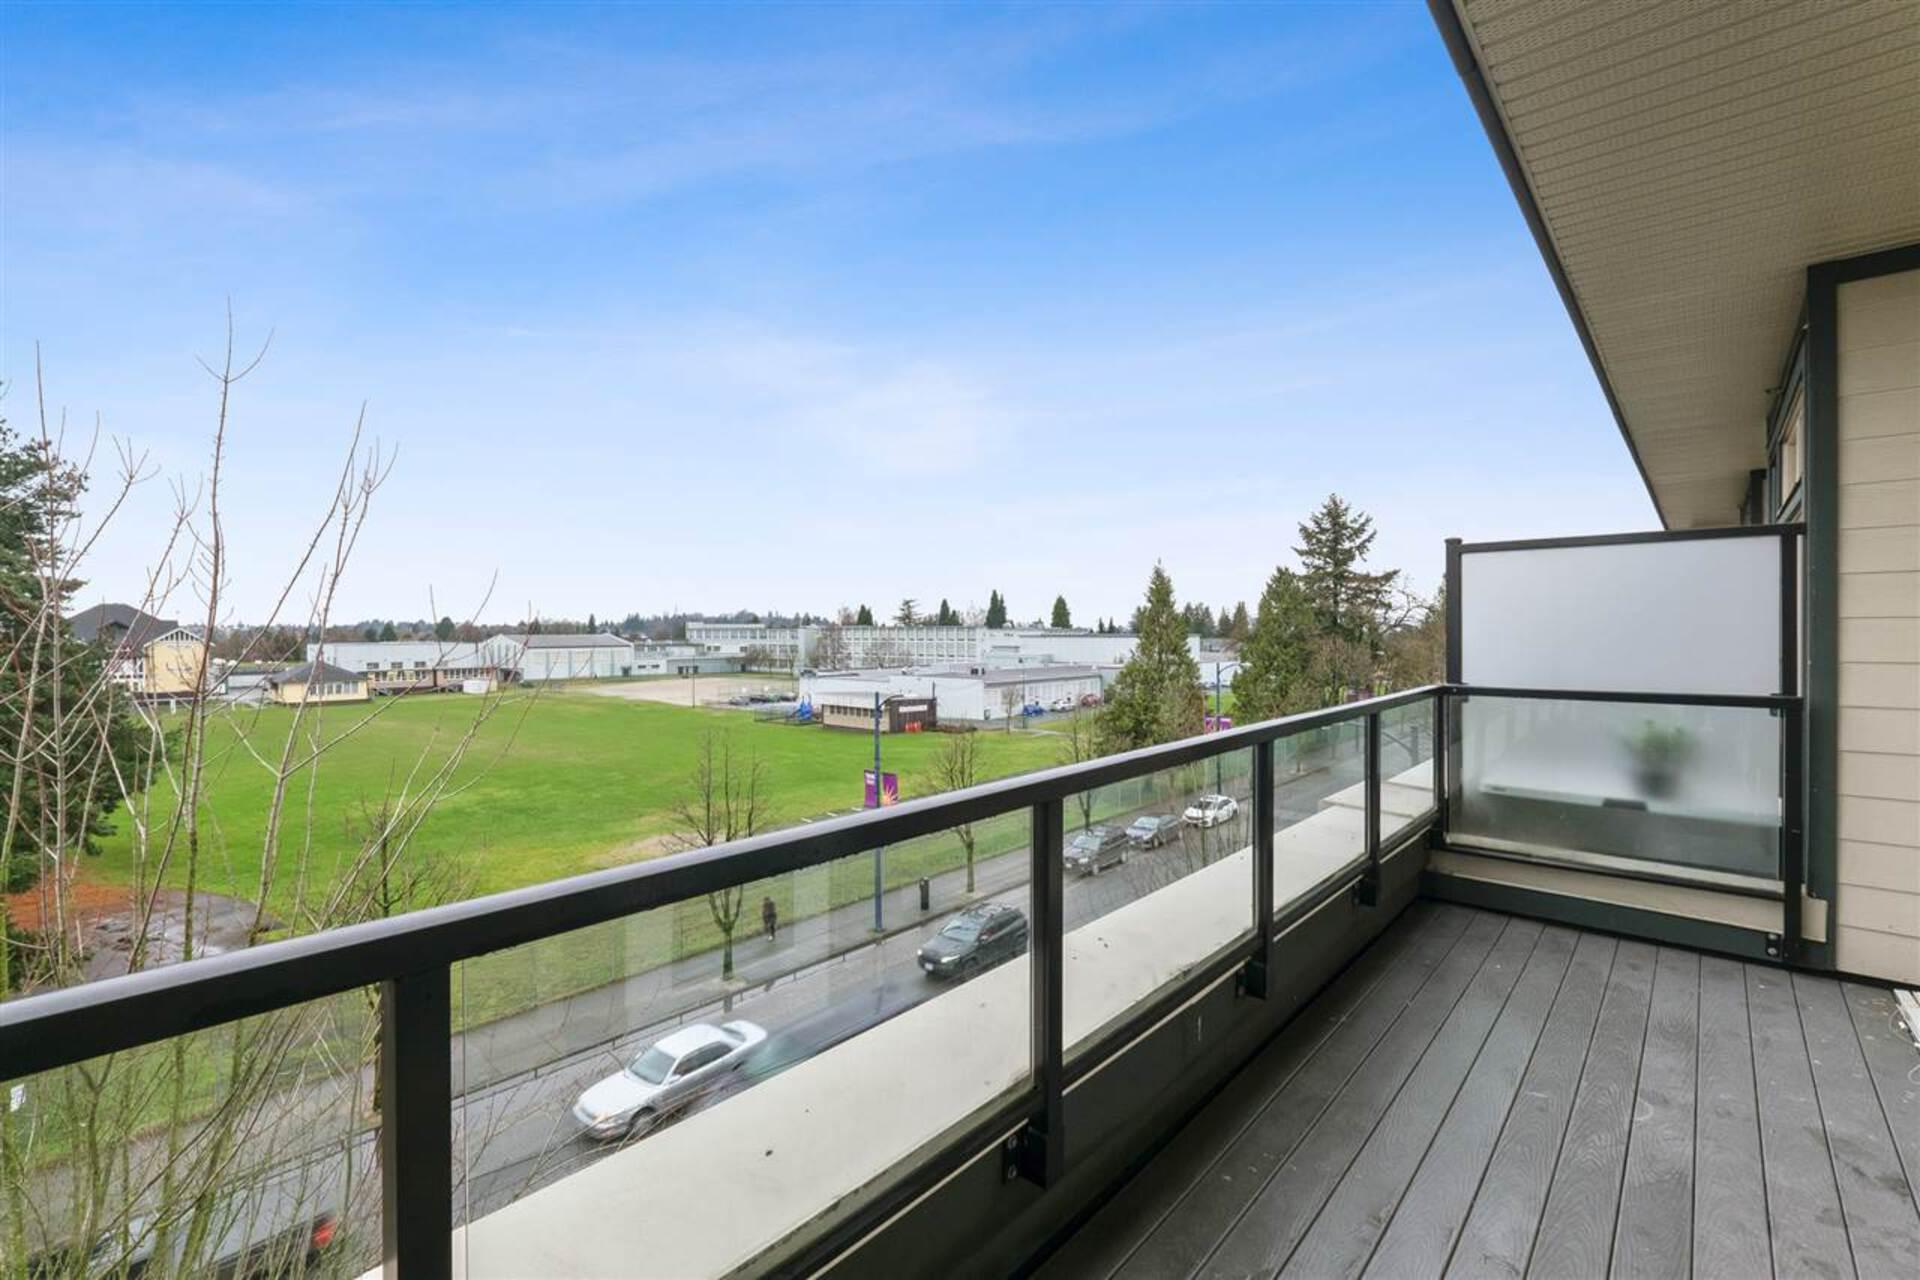 707-e-43-avenue-fraser-ve-vancouver-east-17 at 402 - 707 E 43 Avenue, Fraser VE, Vancouver East